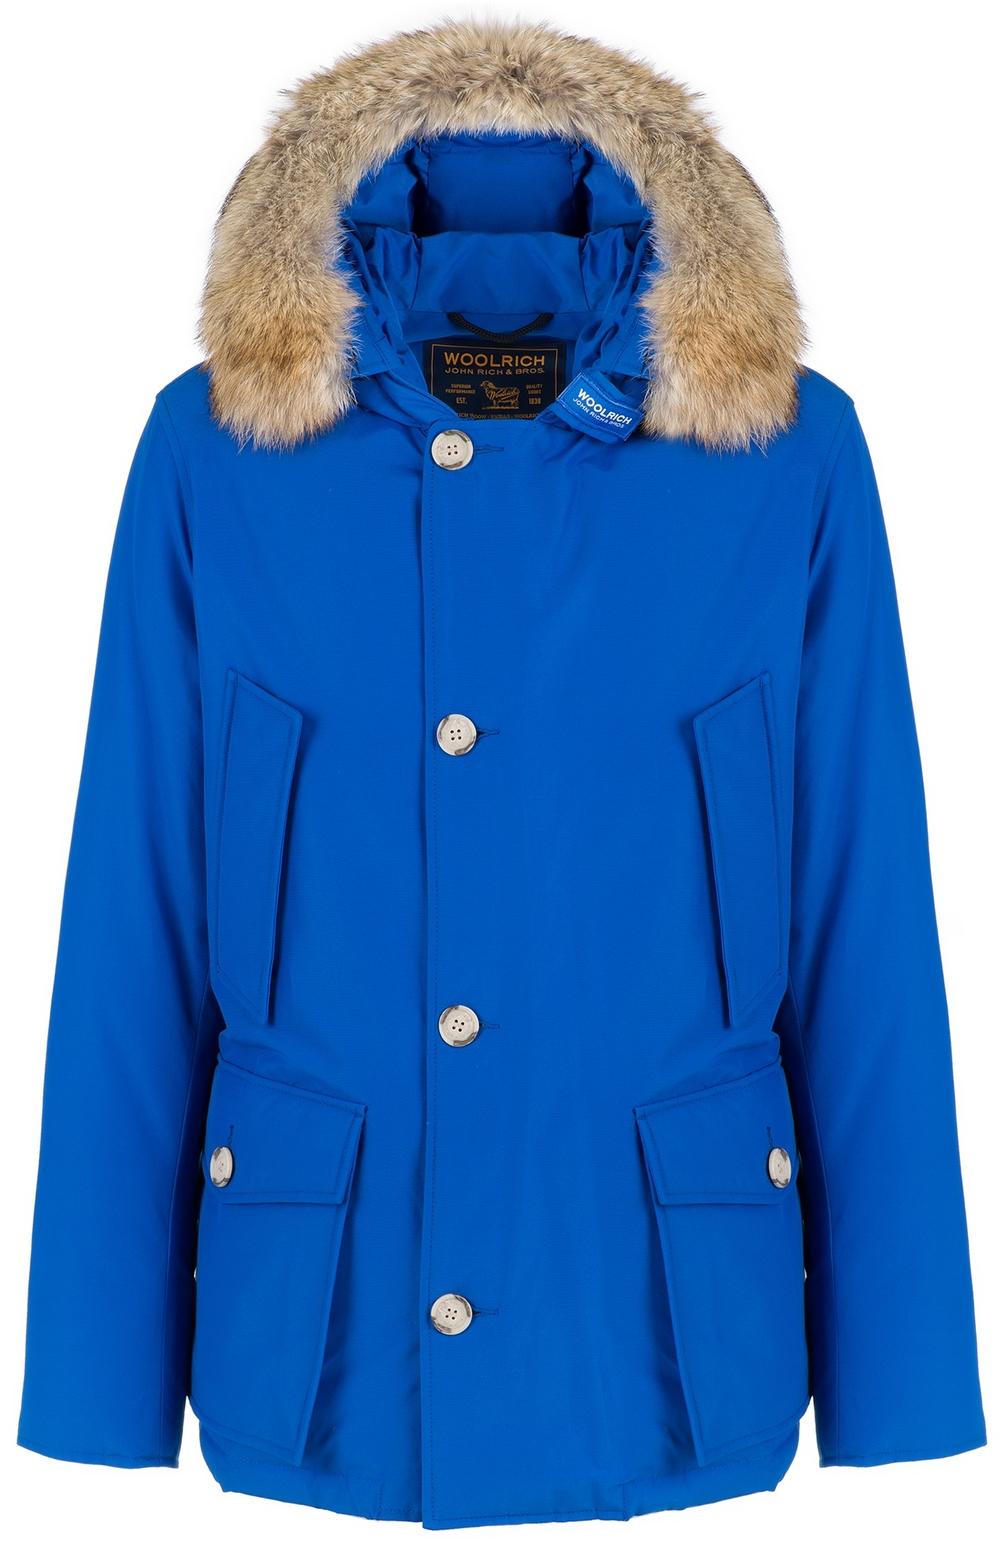 Woolrich® John Rich + Bros. Arctic Anorak, $725